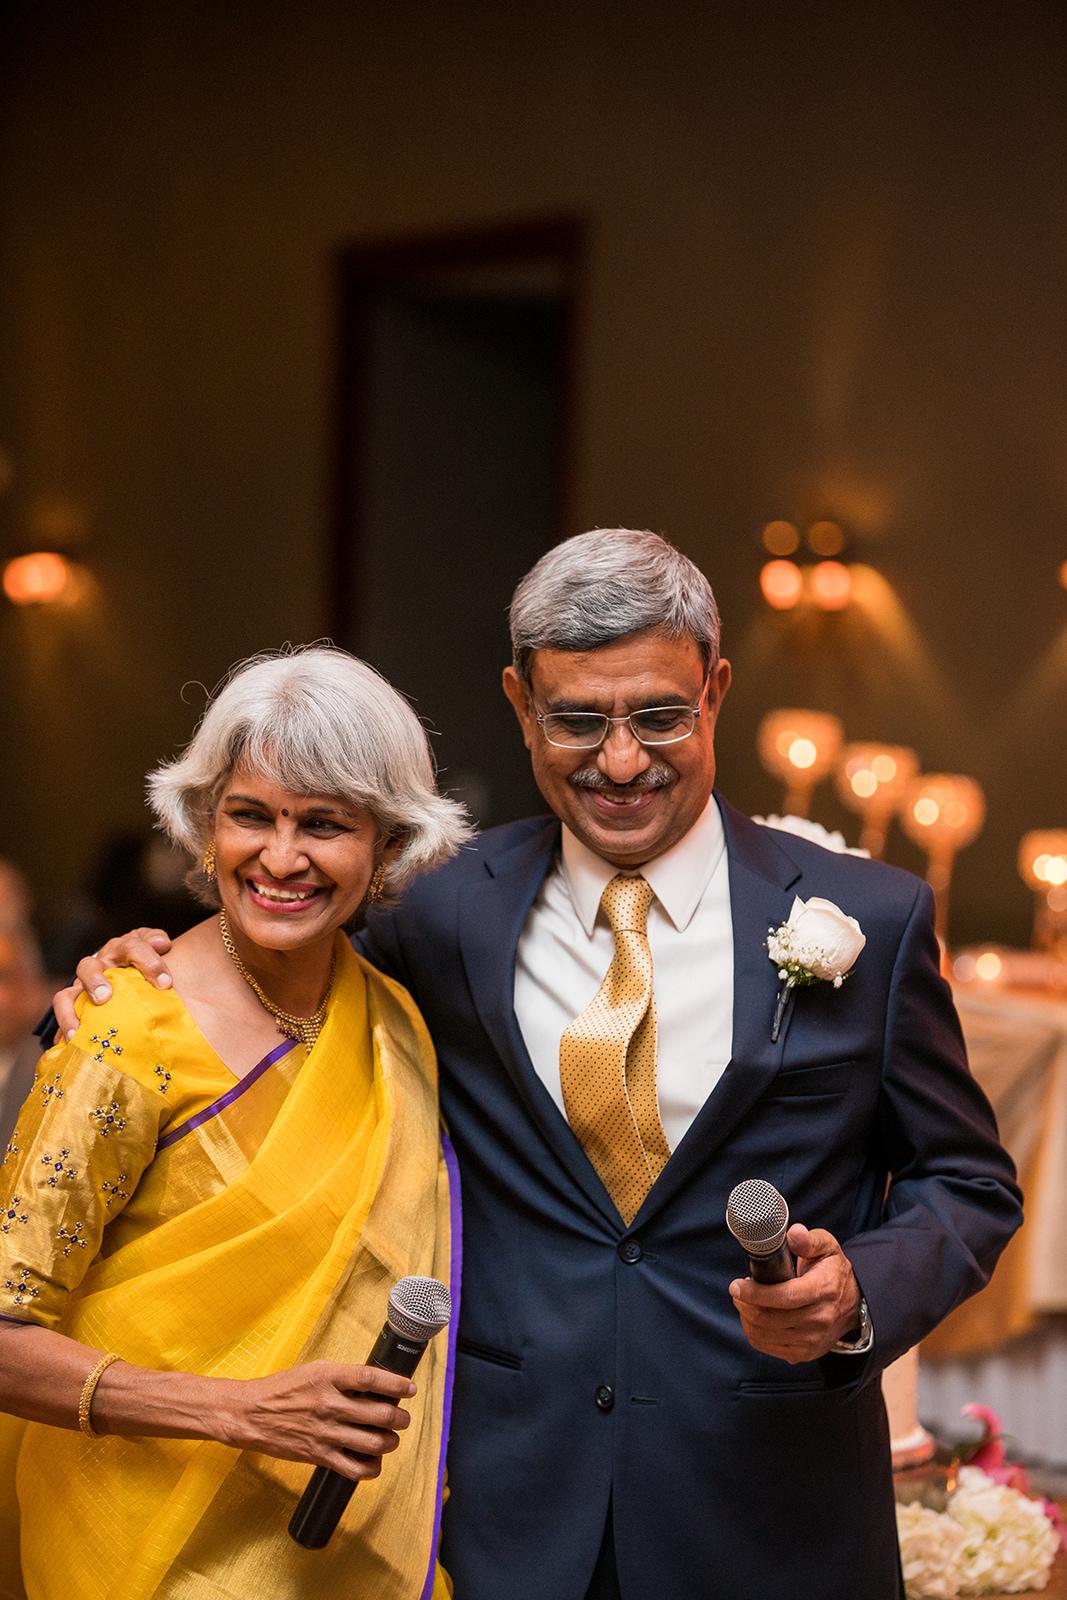 Le Cape Weddings - South Asian Wedding - Ishani and Sidhart - Wedding Reception-30.jpg